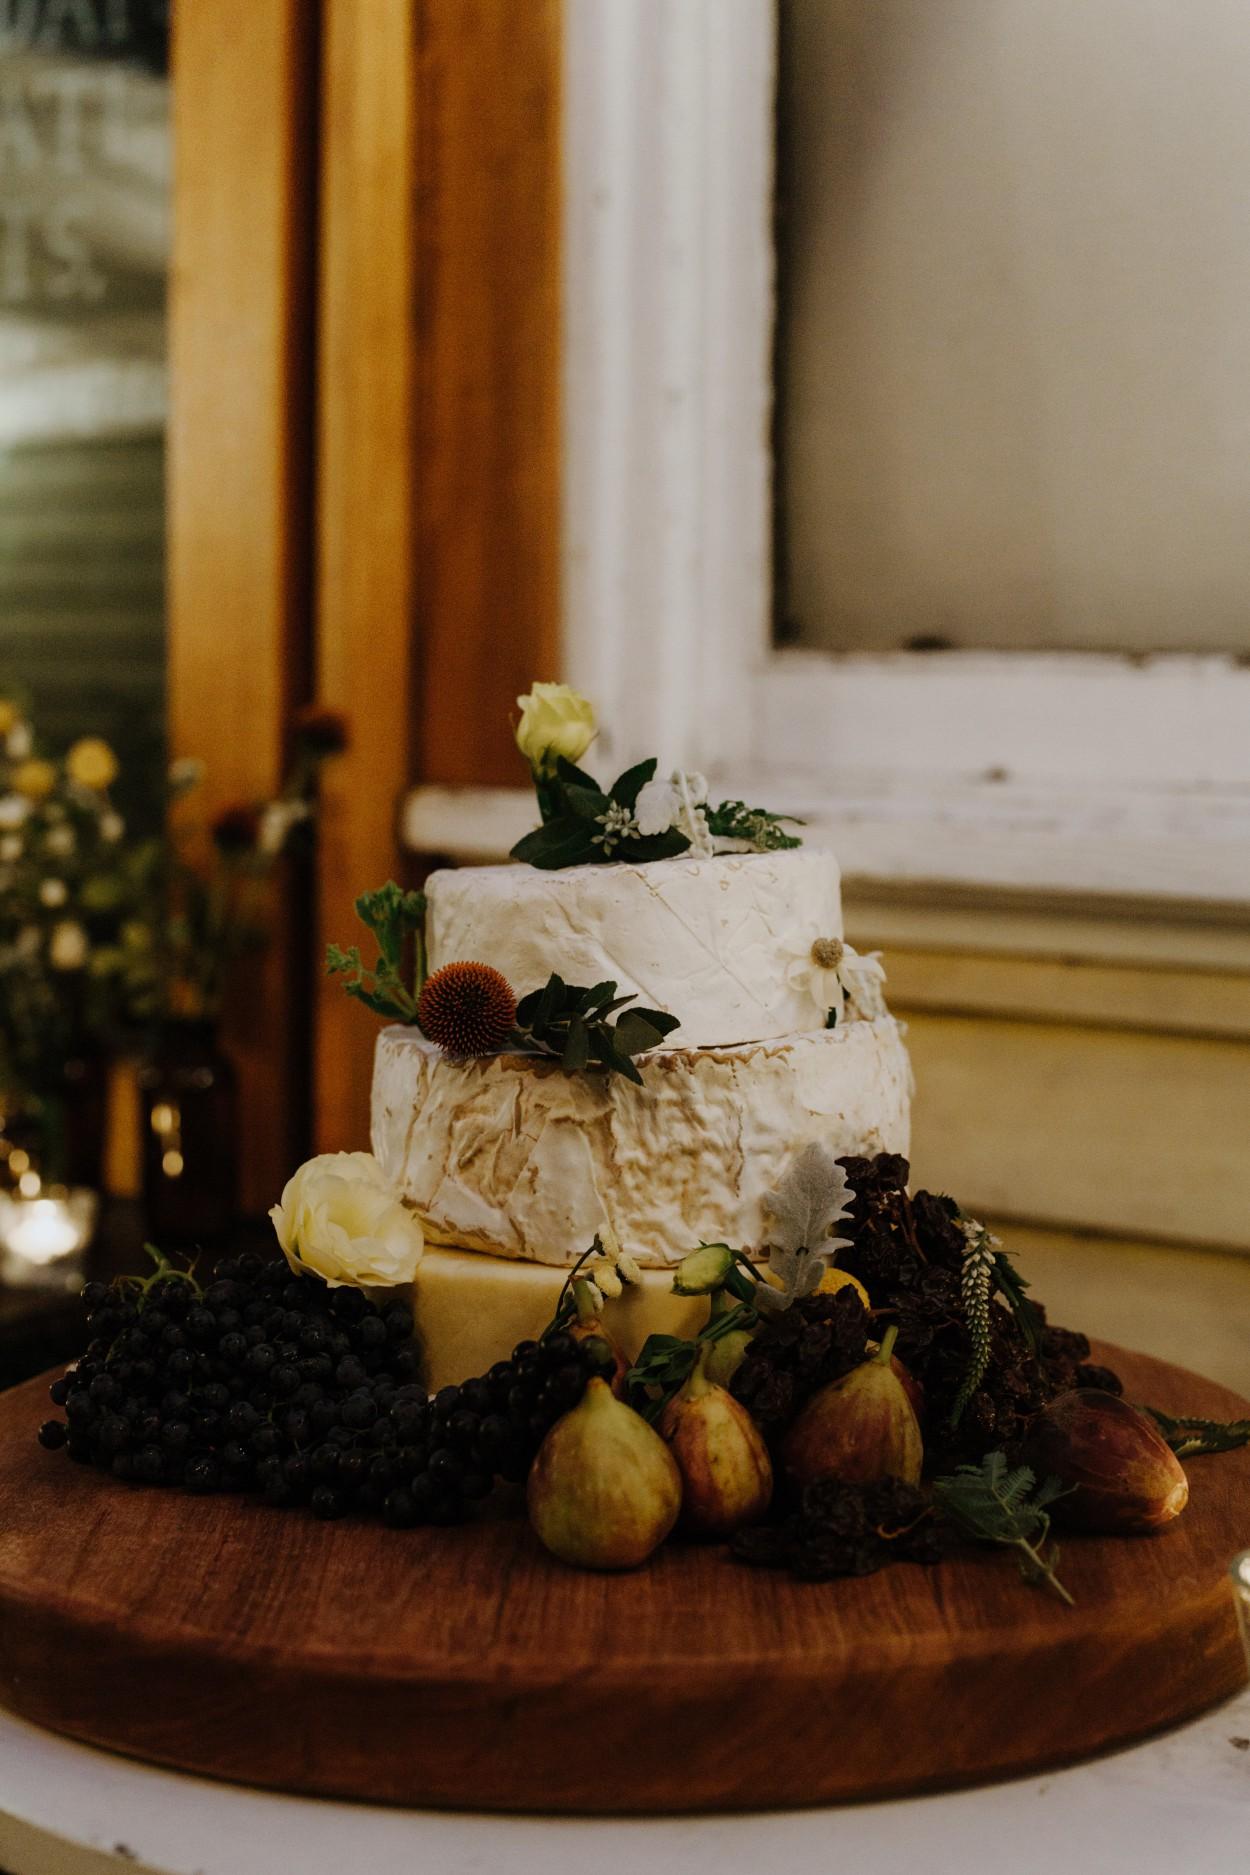 I-Got-You-Babe-&-Co.-Wedding-Photographers-Elsa004.jpg